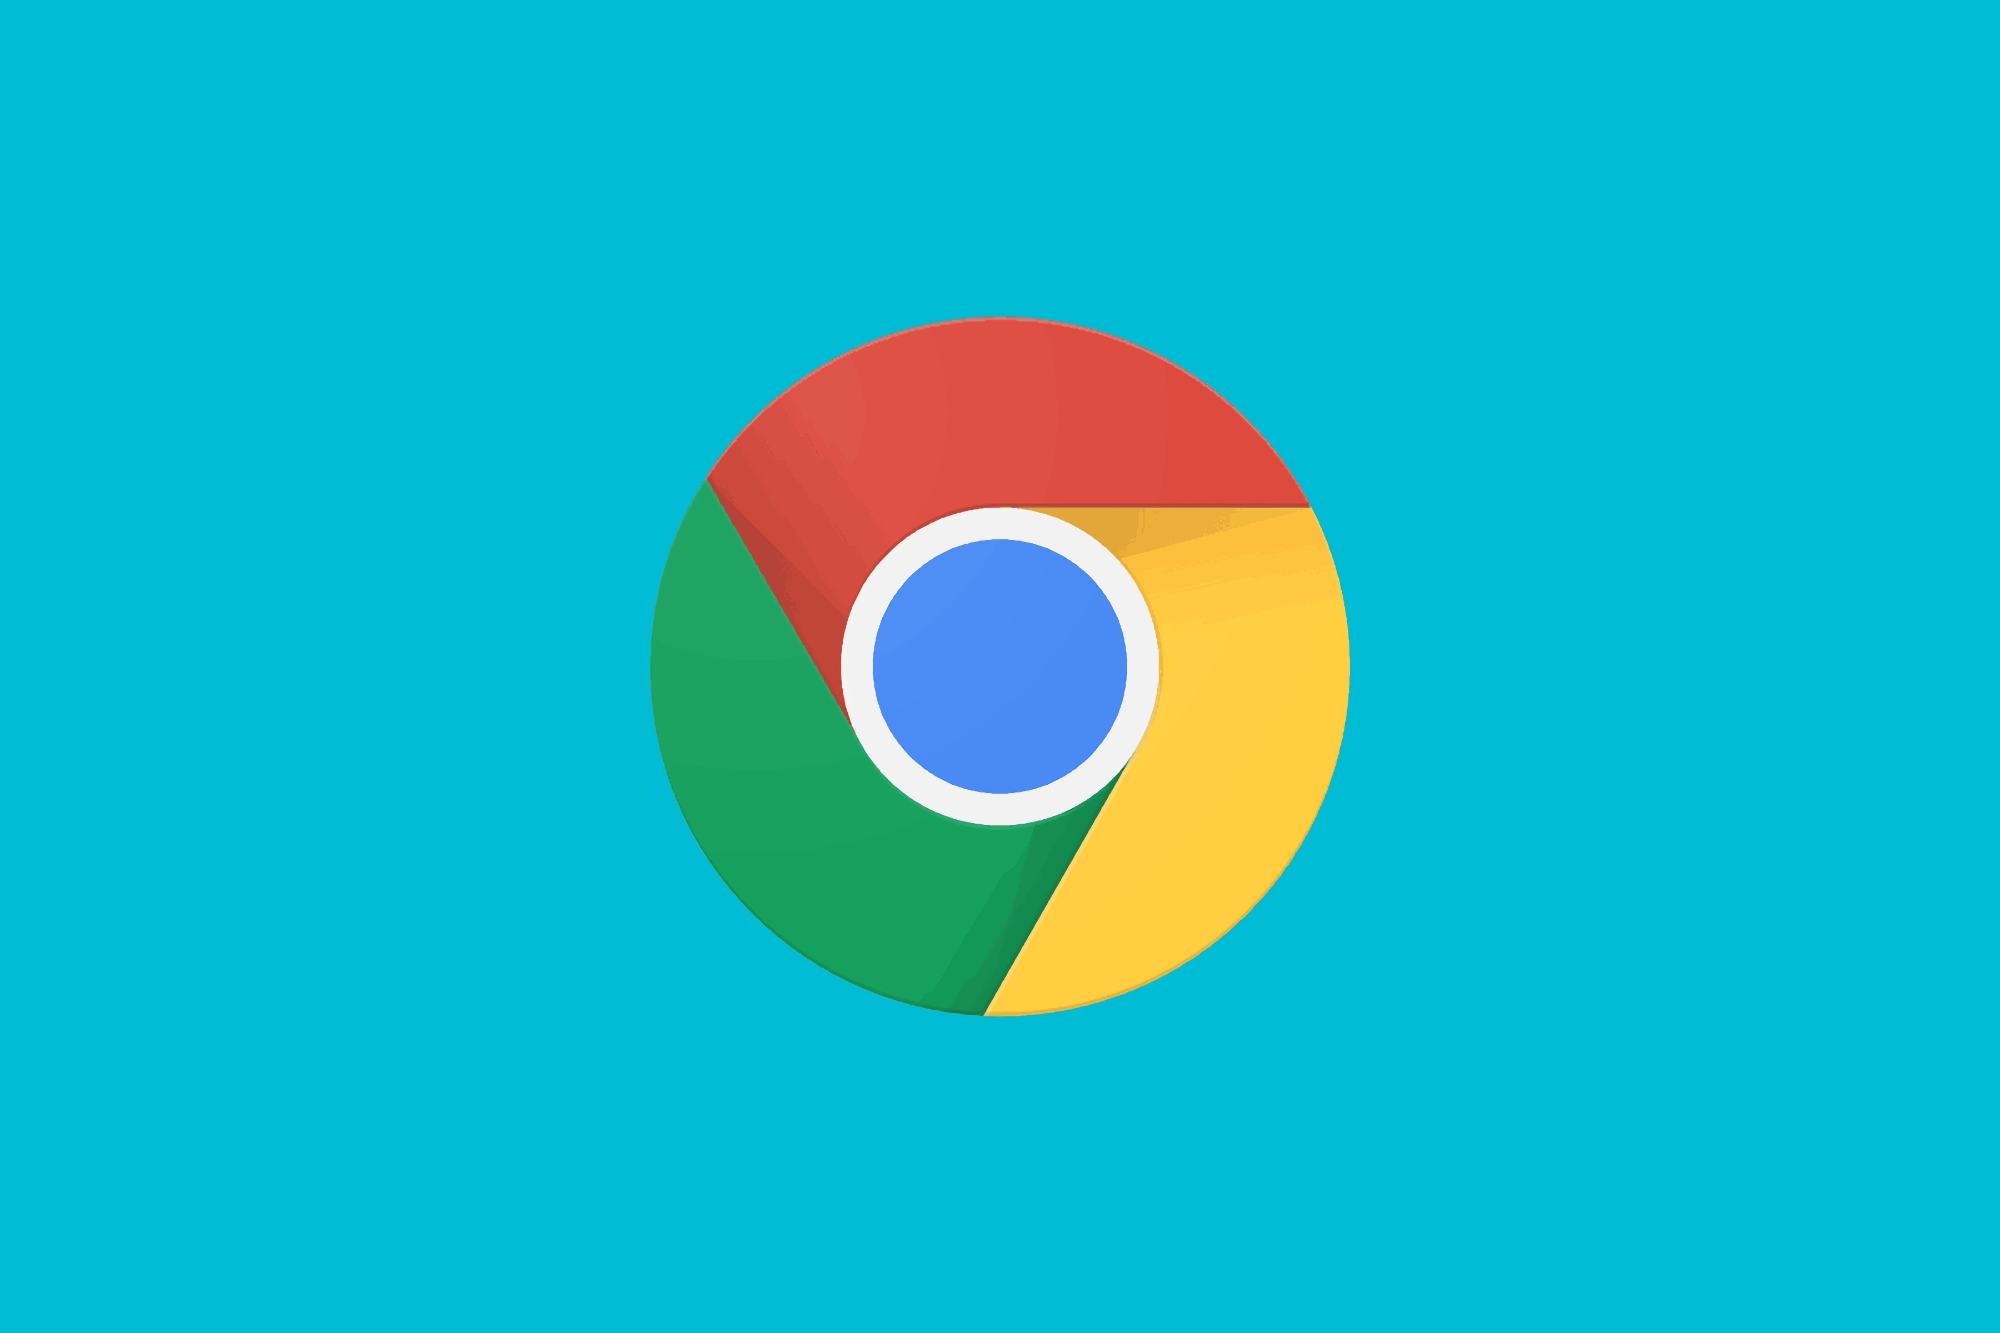 Google Chrome перестанет работать на компьютерах со старыми процессорами x86